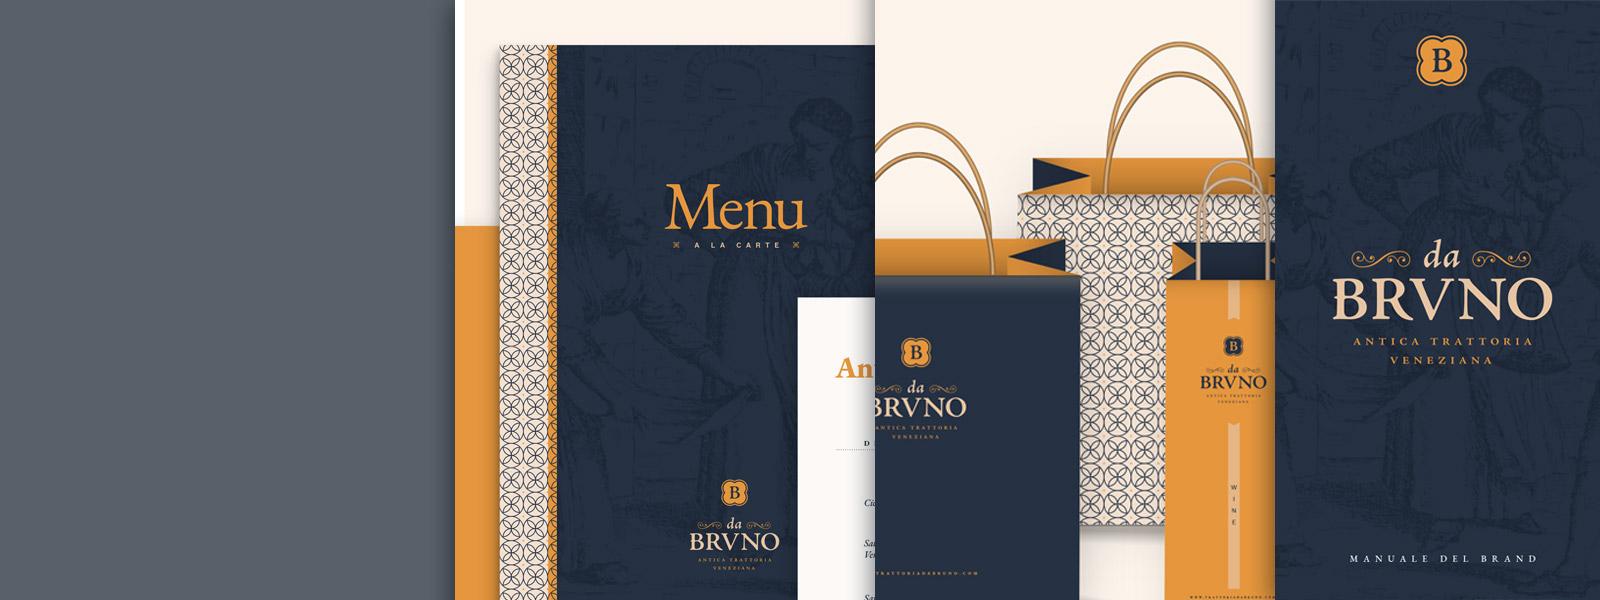 Muse Comunicazione - Da Bruno Antica Trattoria Veneziana: Brand e Logo Design